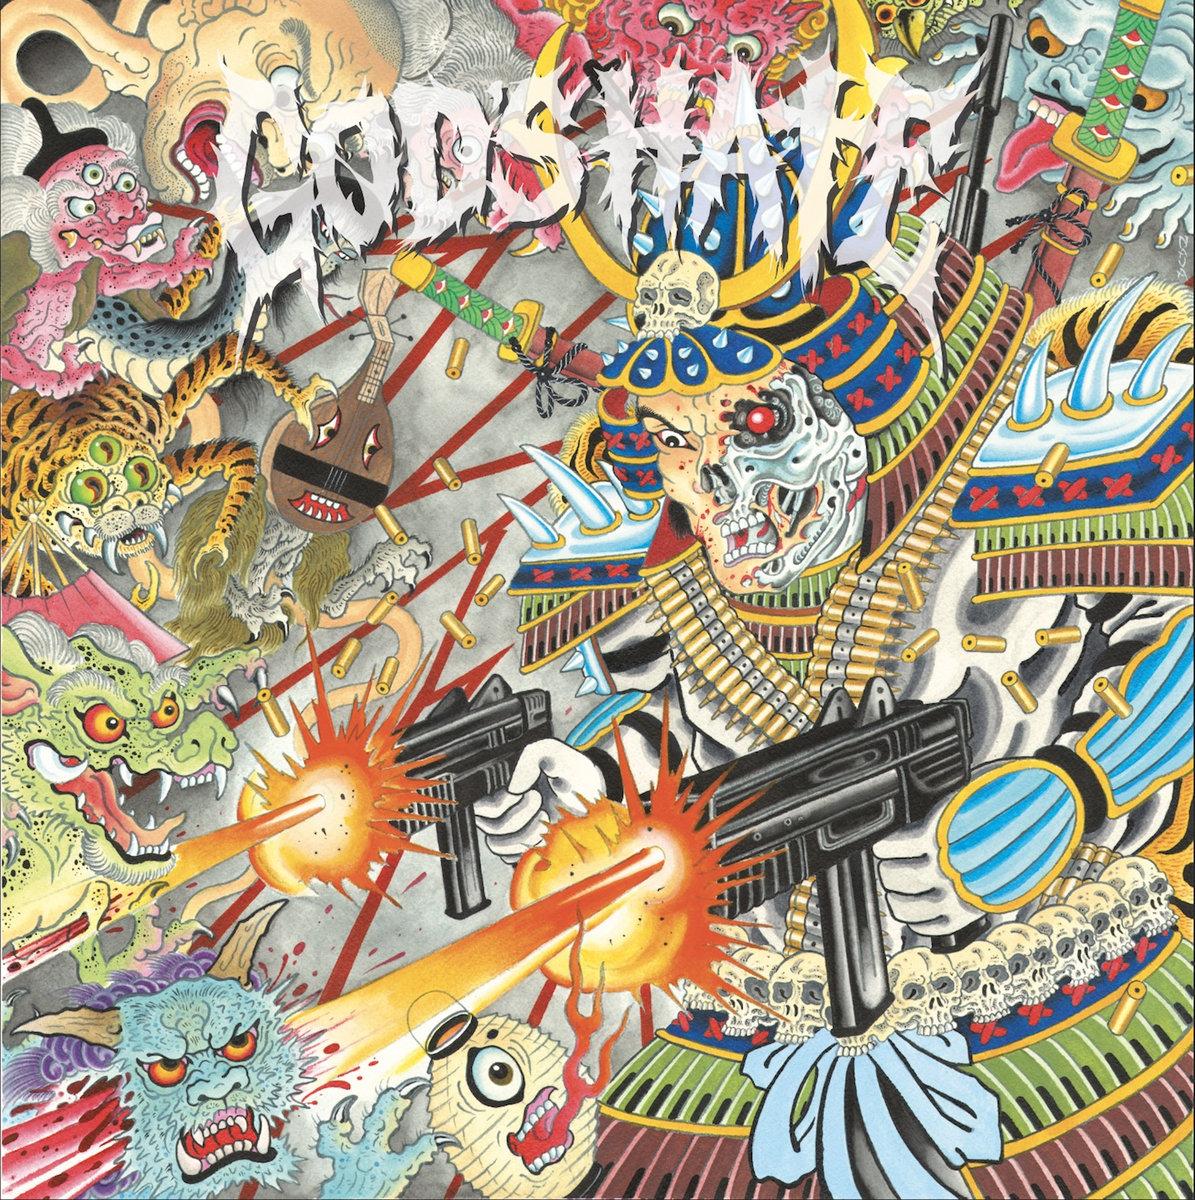 God's Hate Album Cover Artwork